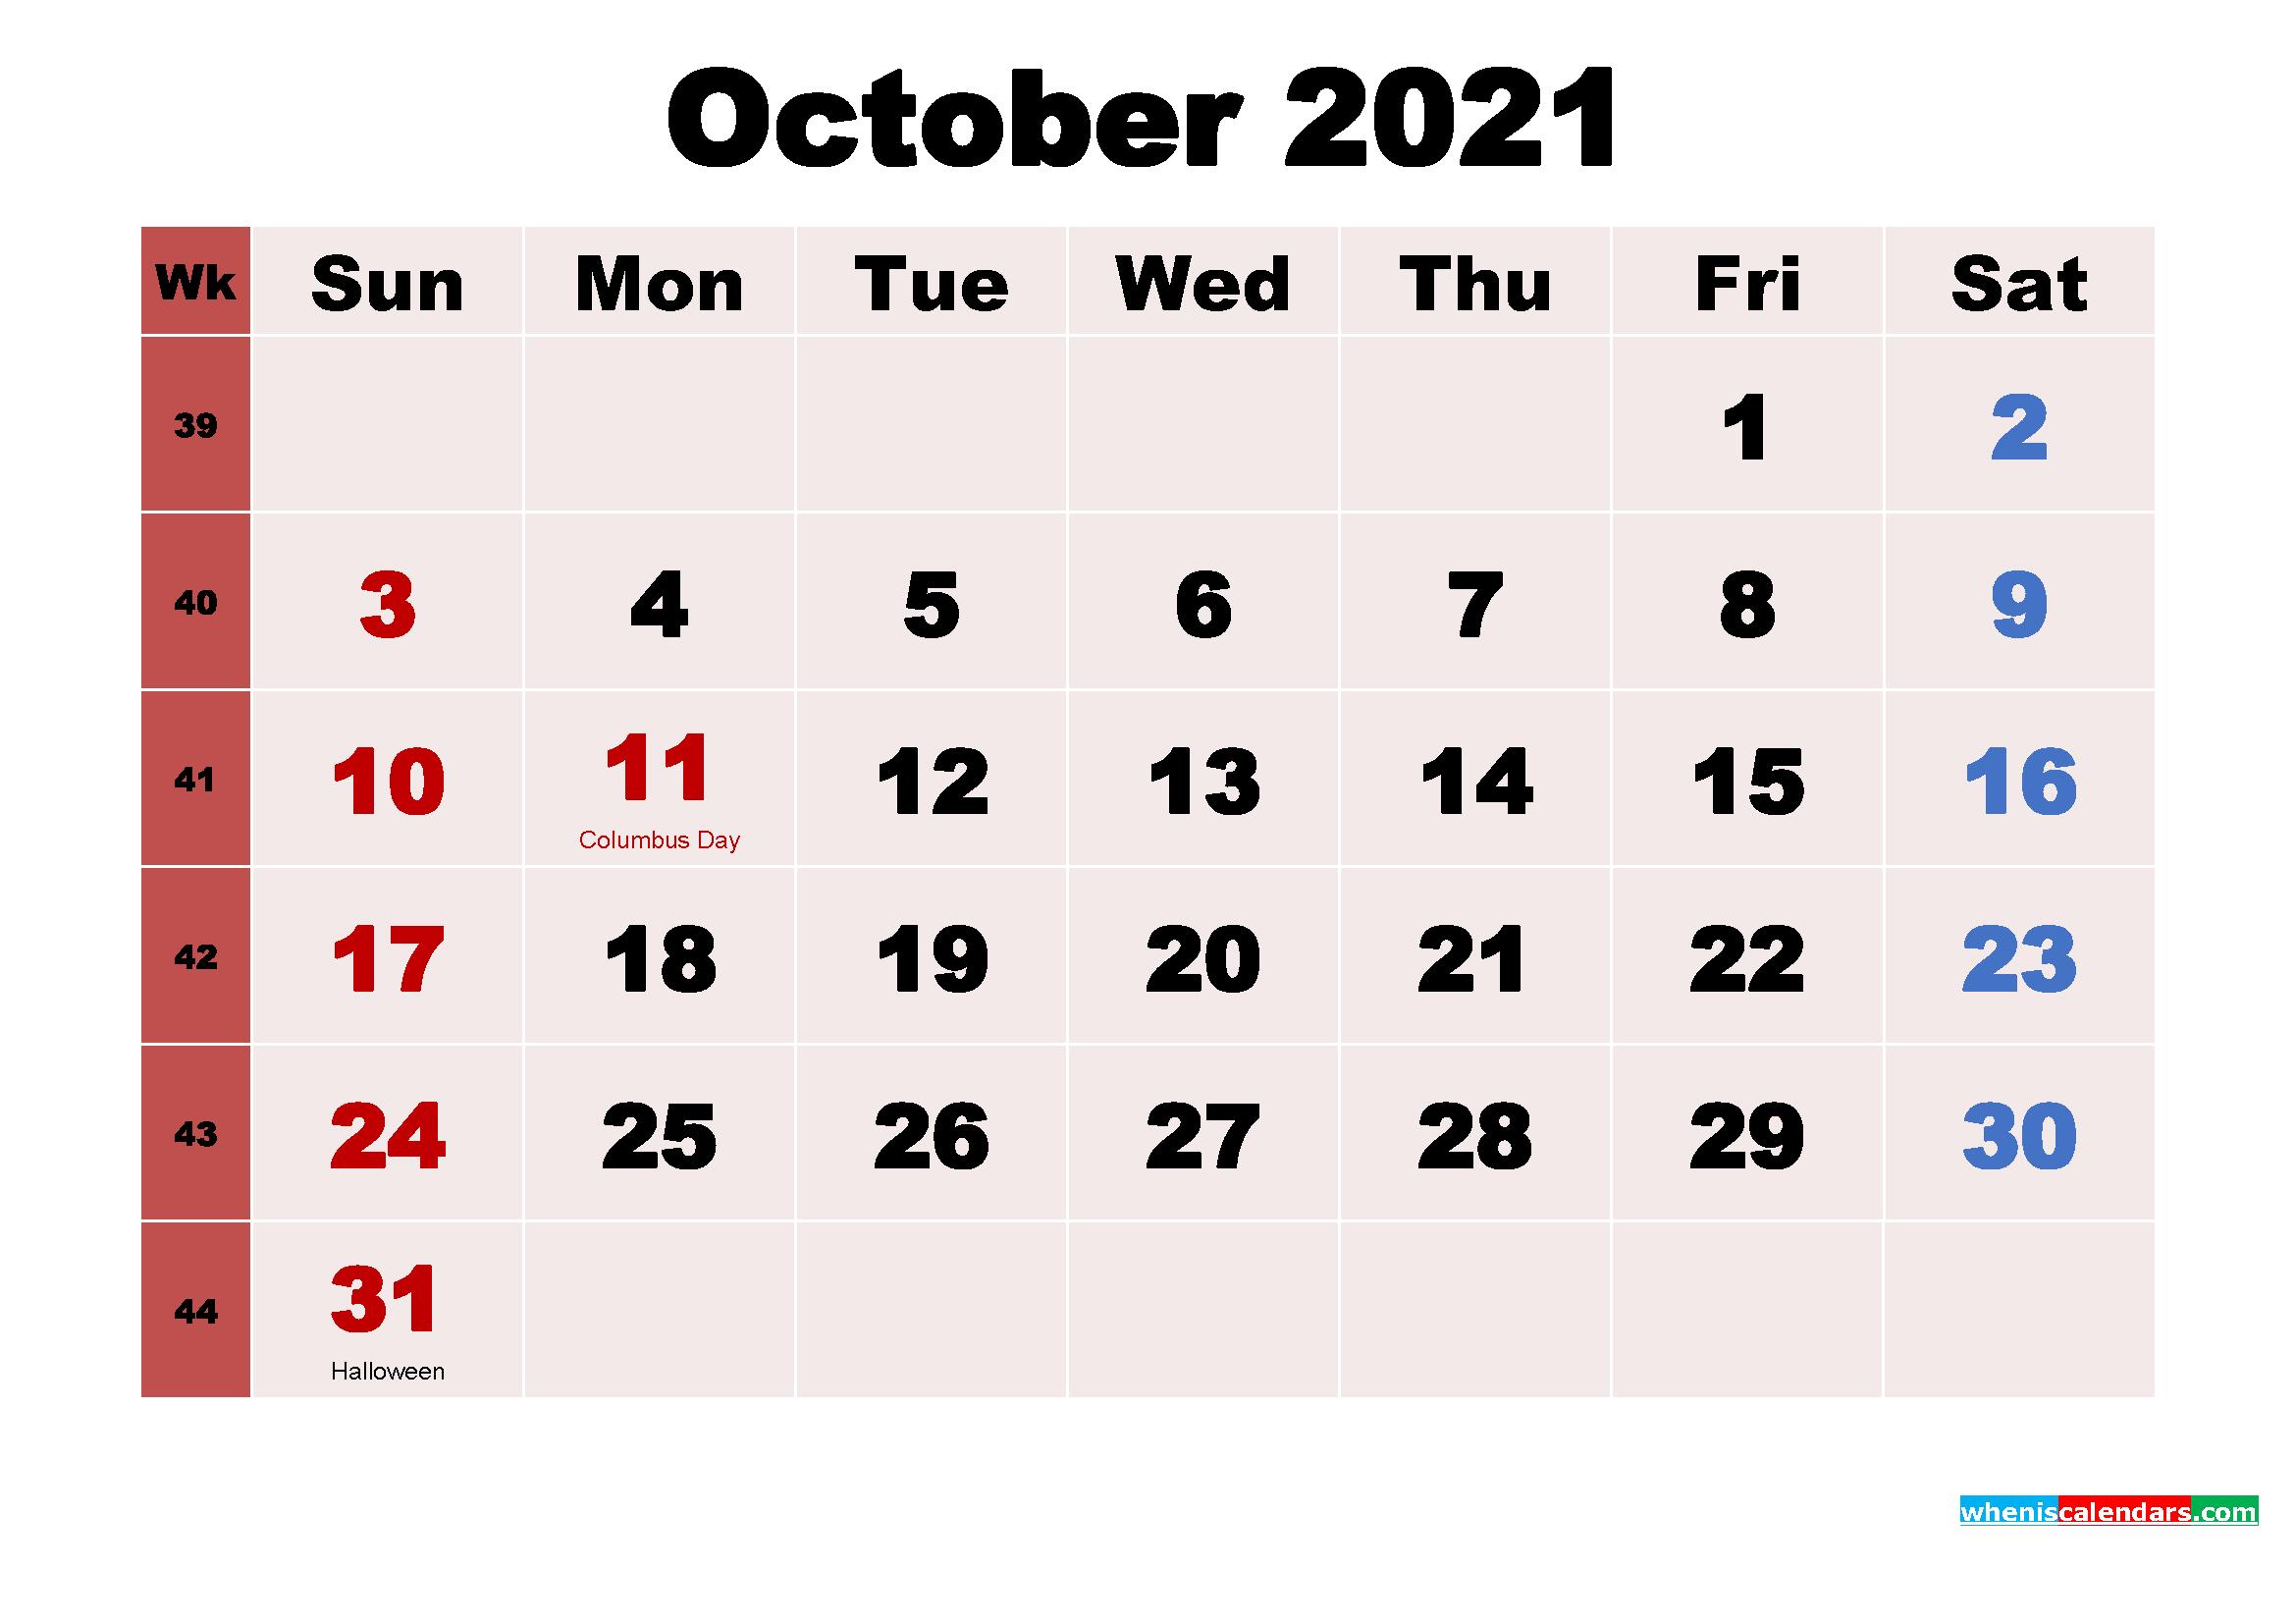 October 2021 Calendar Wallpaper Free Download